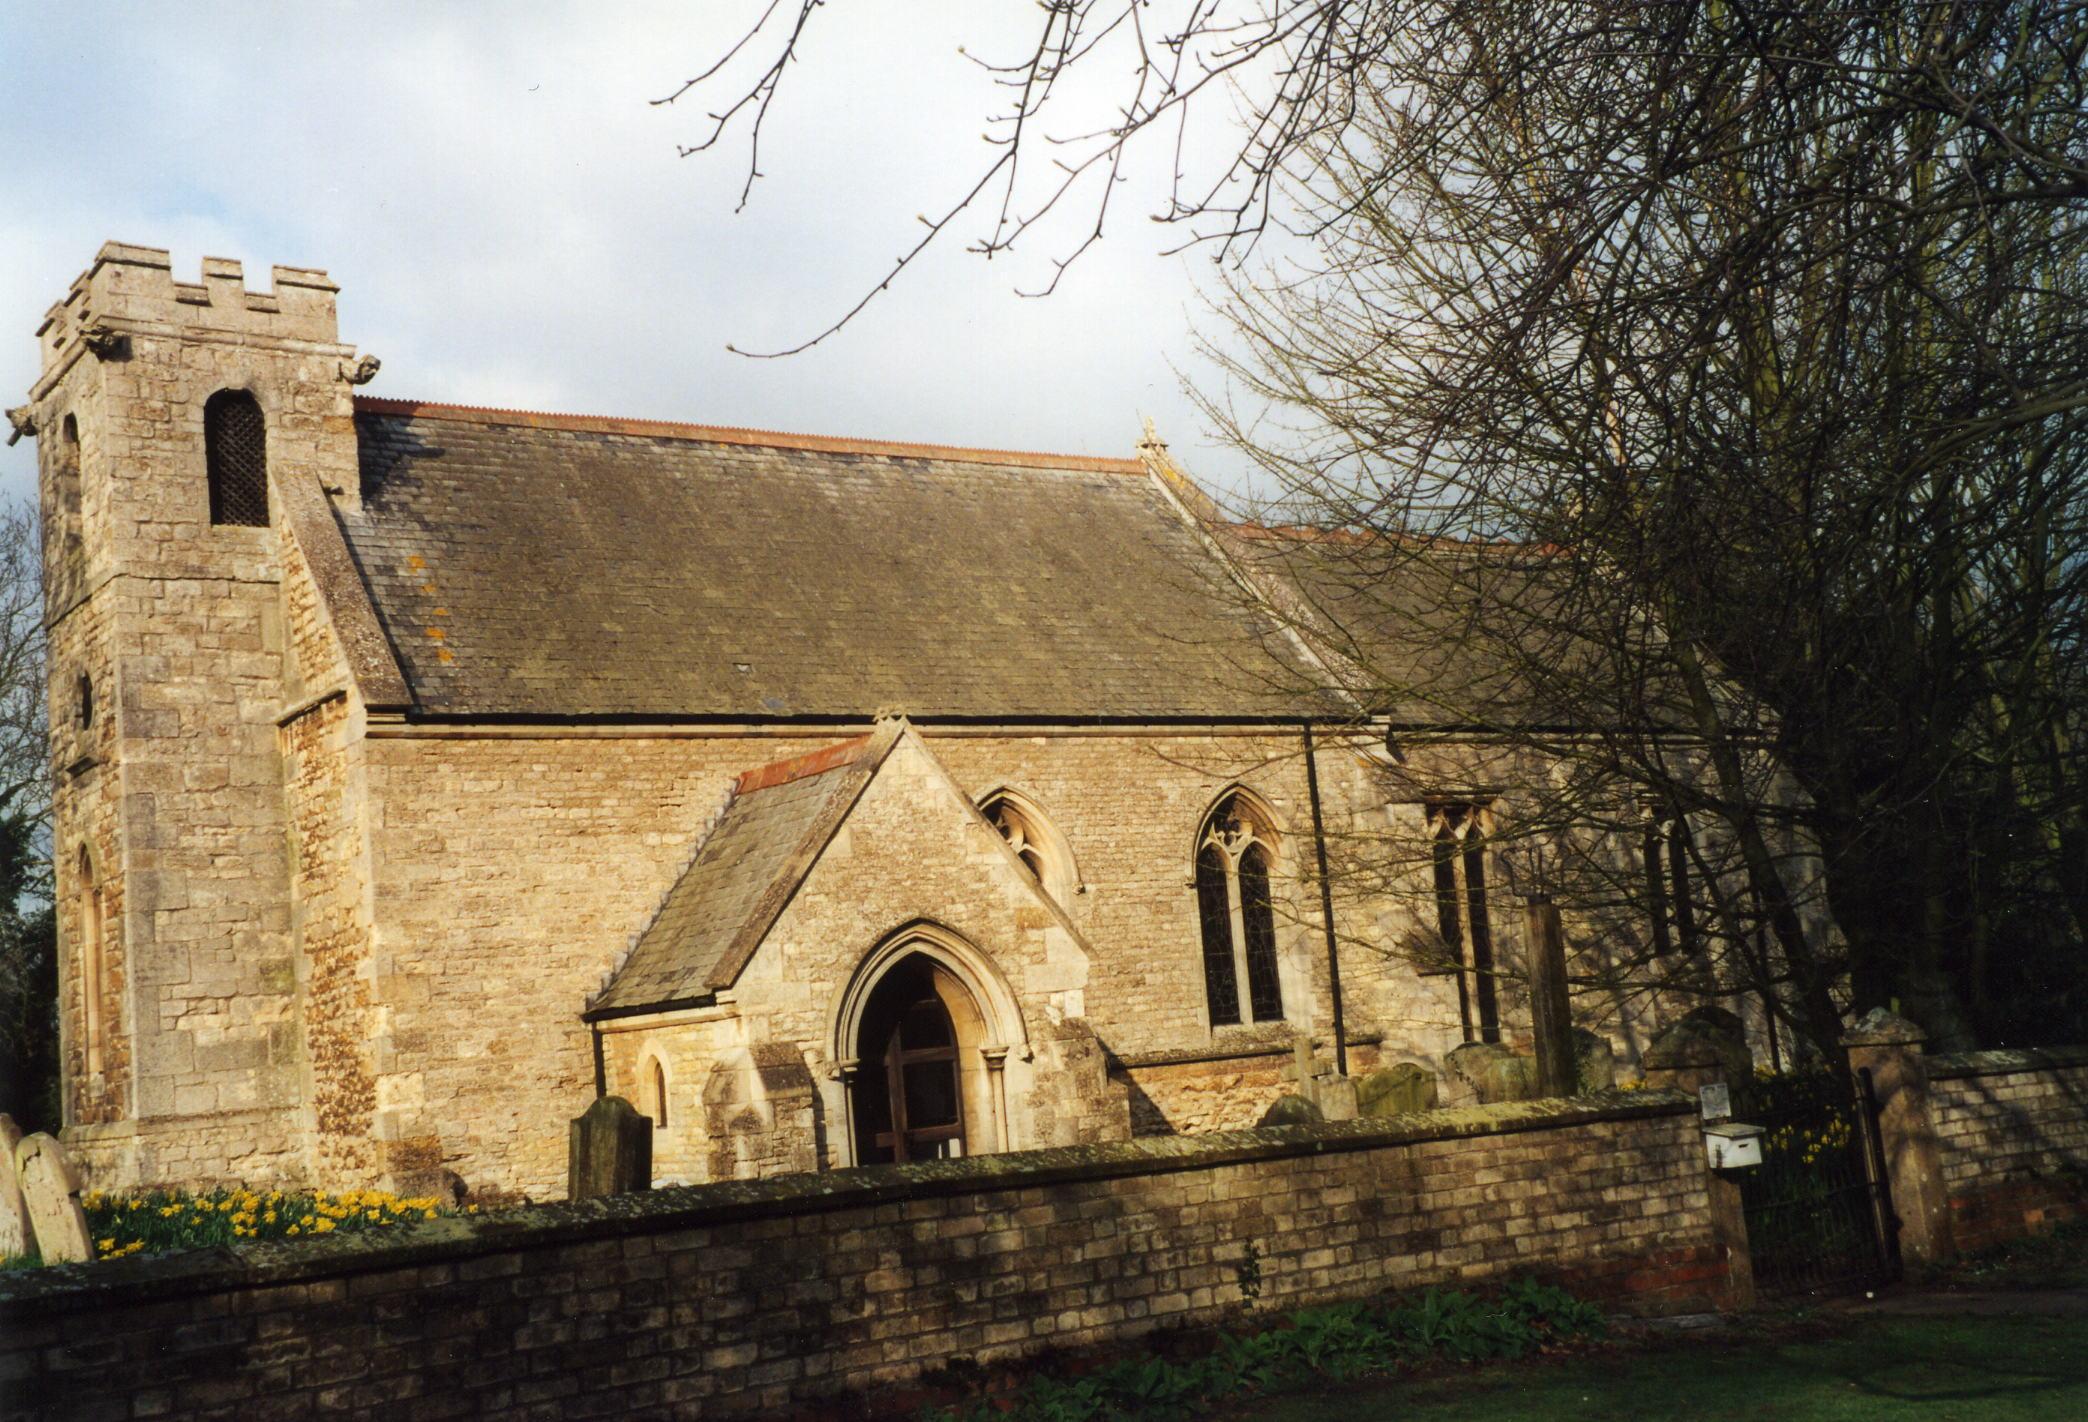 Blyborough St. Alkmond parish church